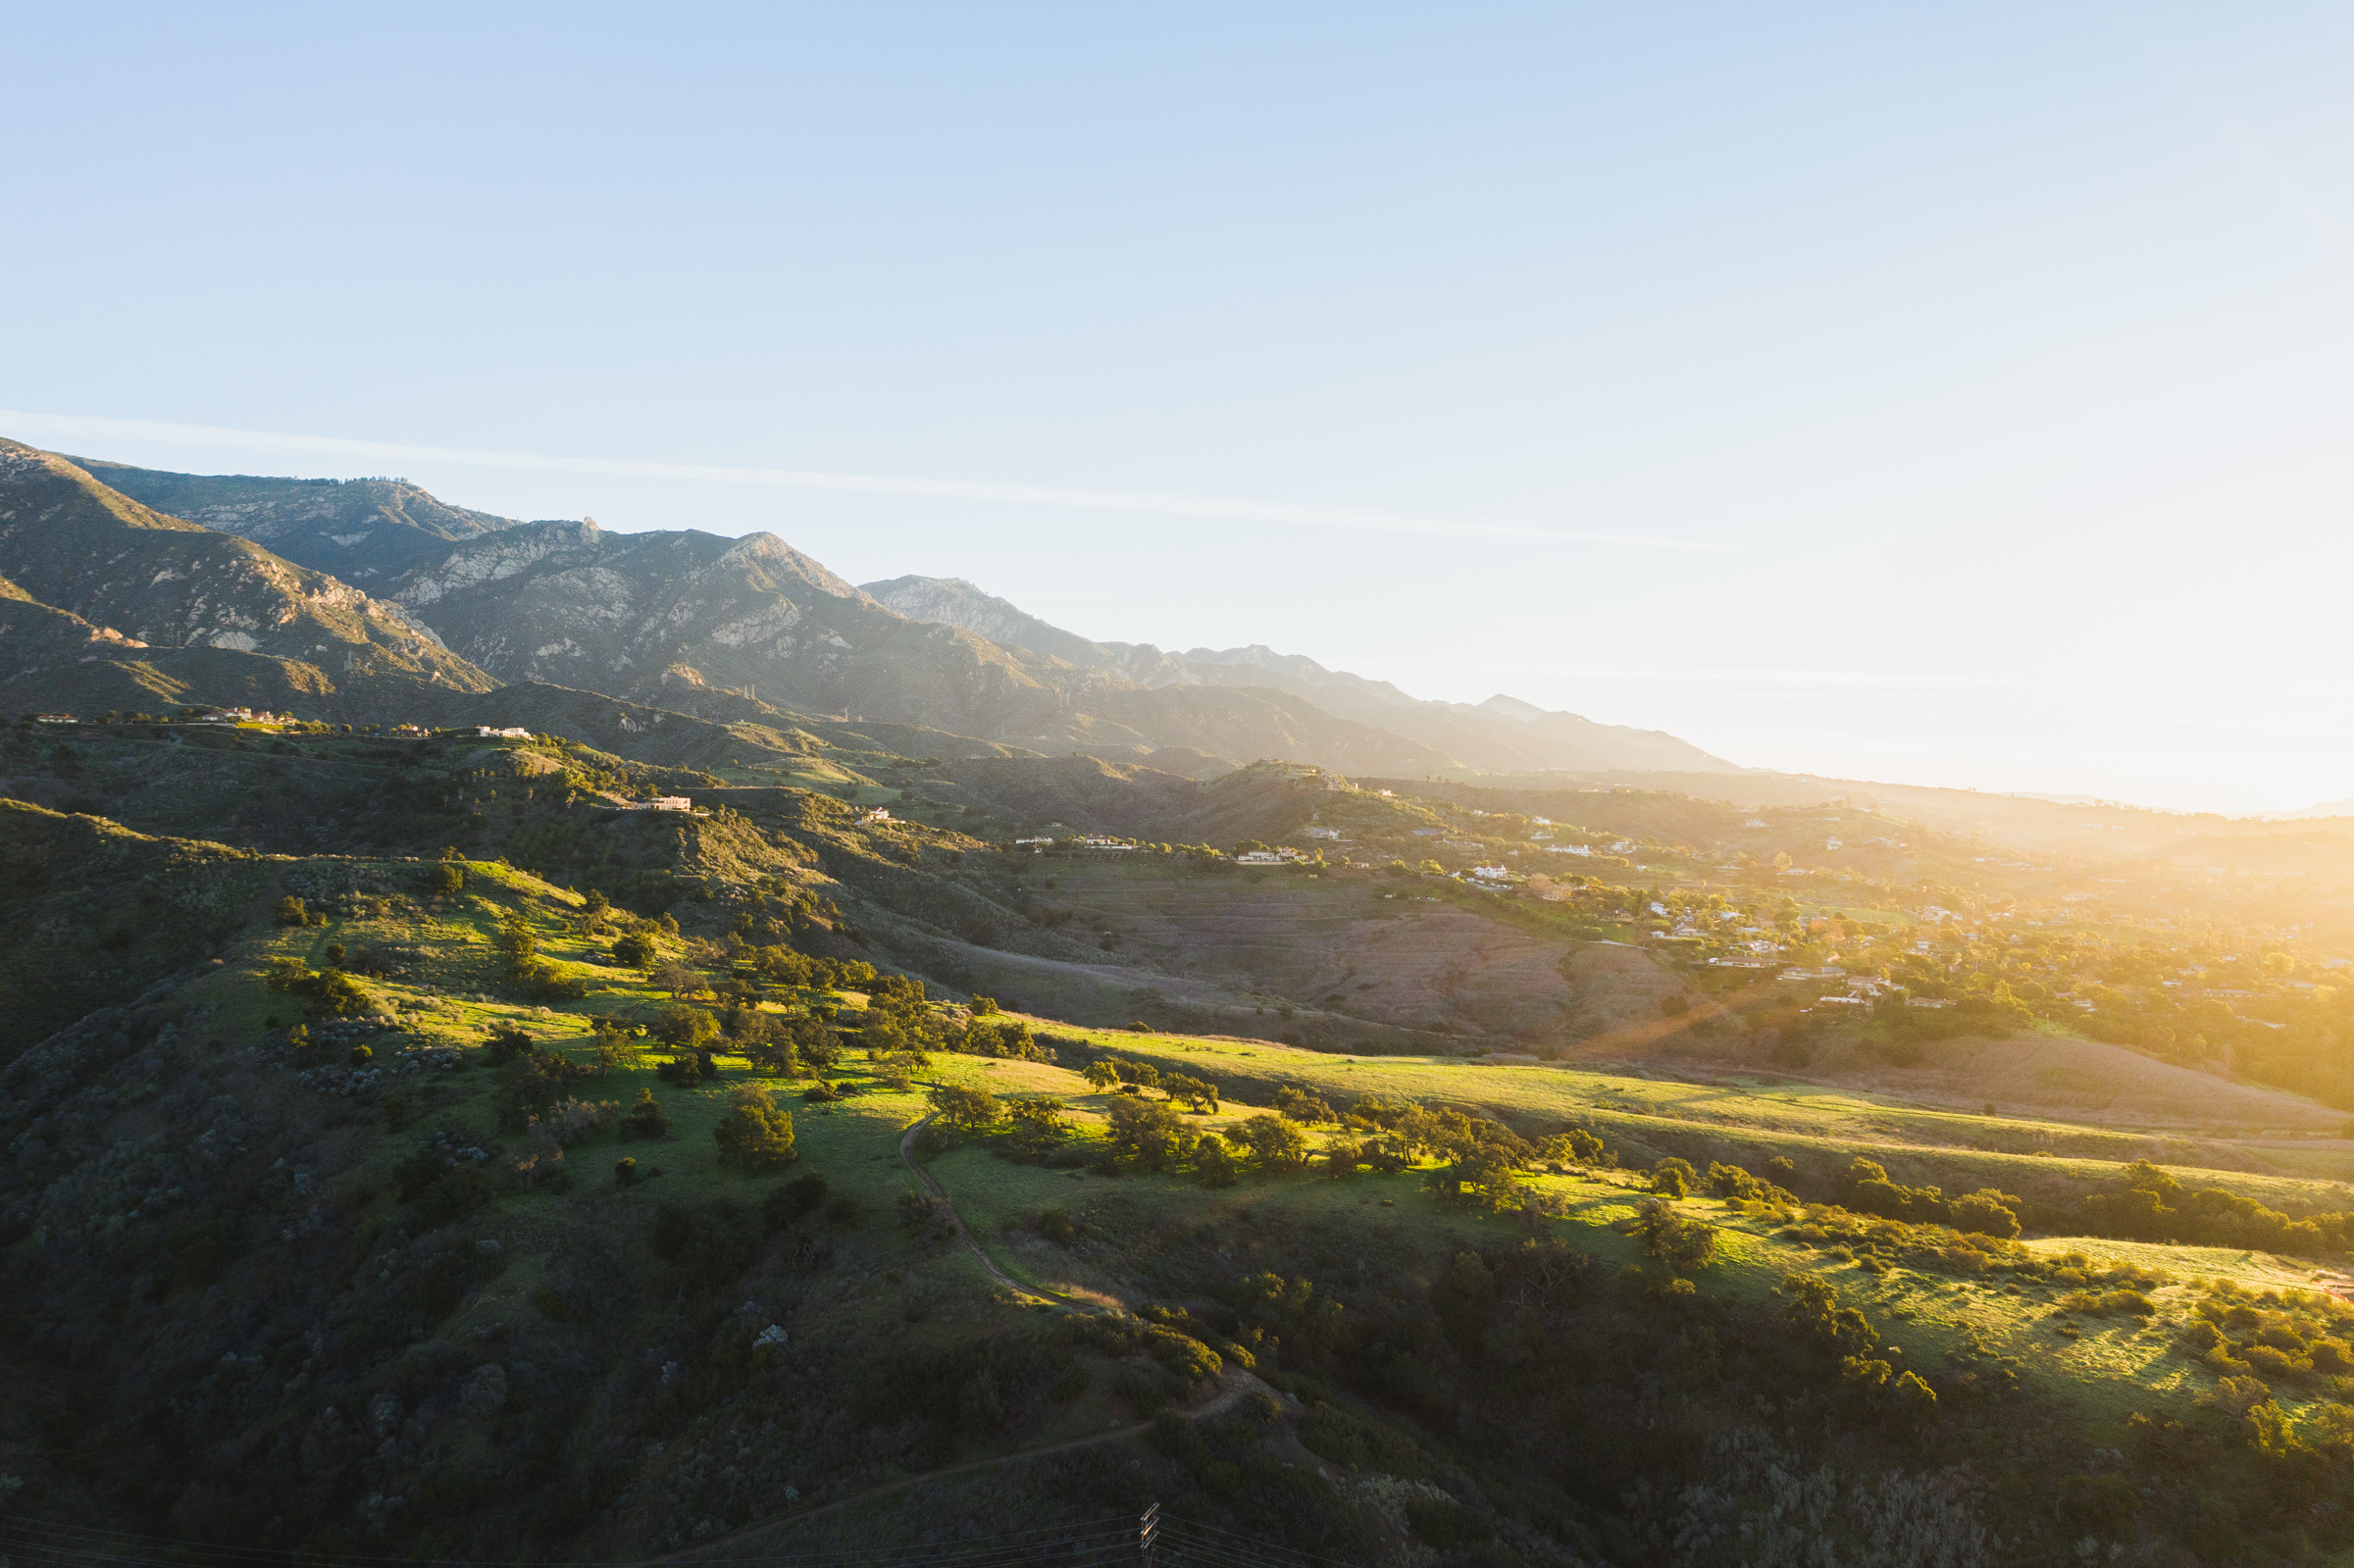 Santa Barbara Drone Aerial Photography